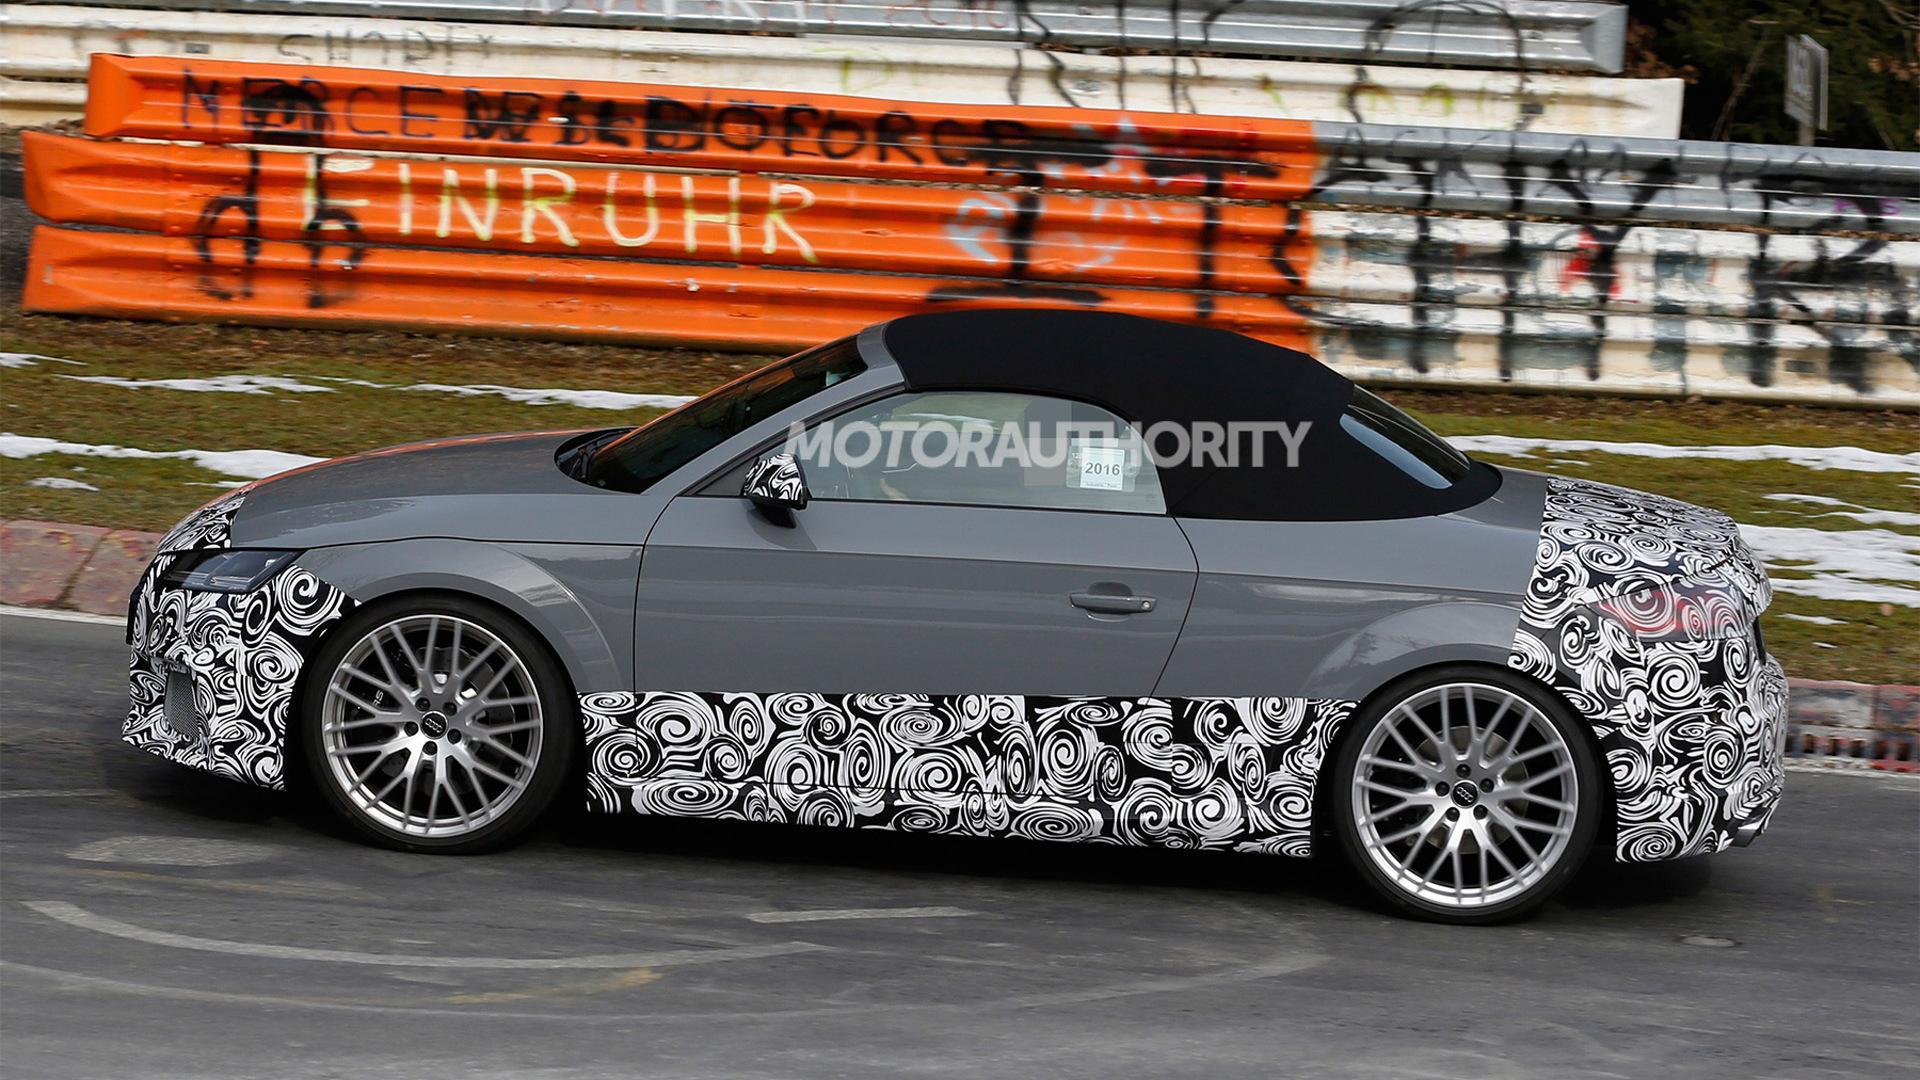 2017 Audi TT RS Roadster spy shots - Image via S. Baldauf/SB-Medien